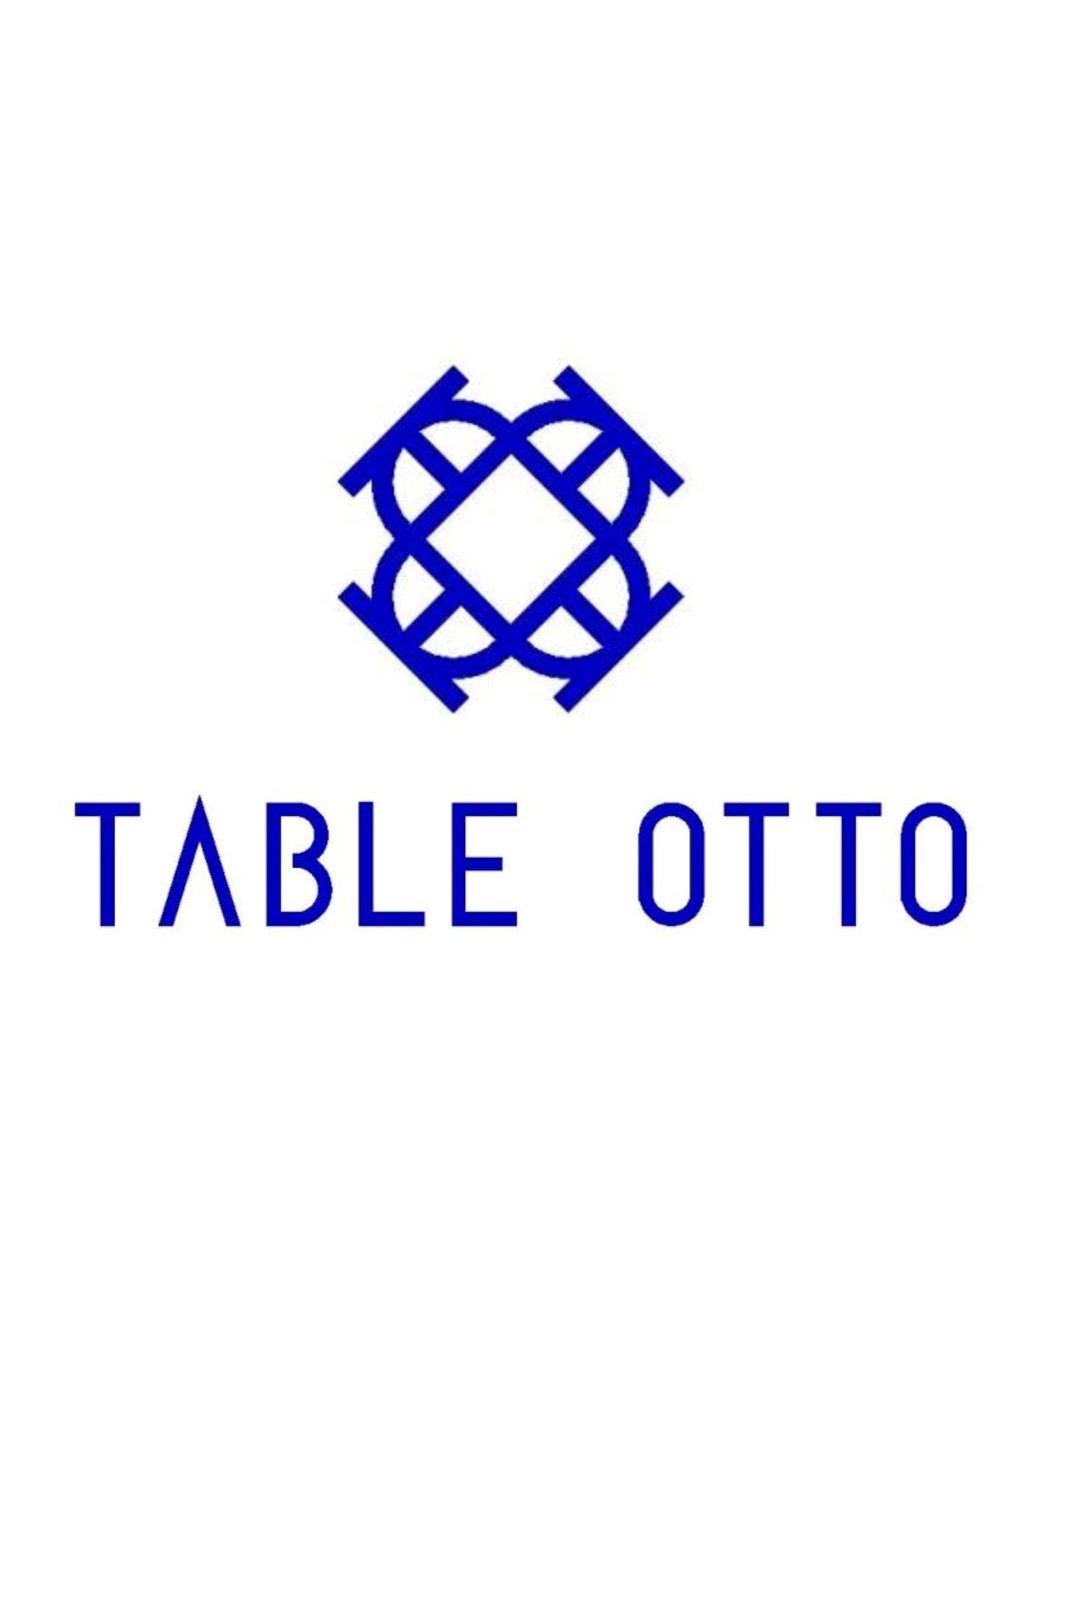 Table Otto